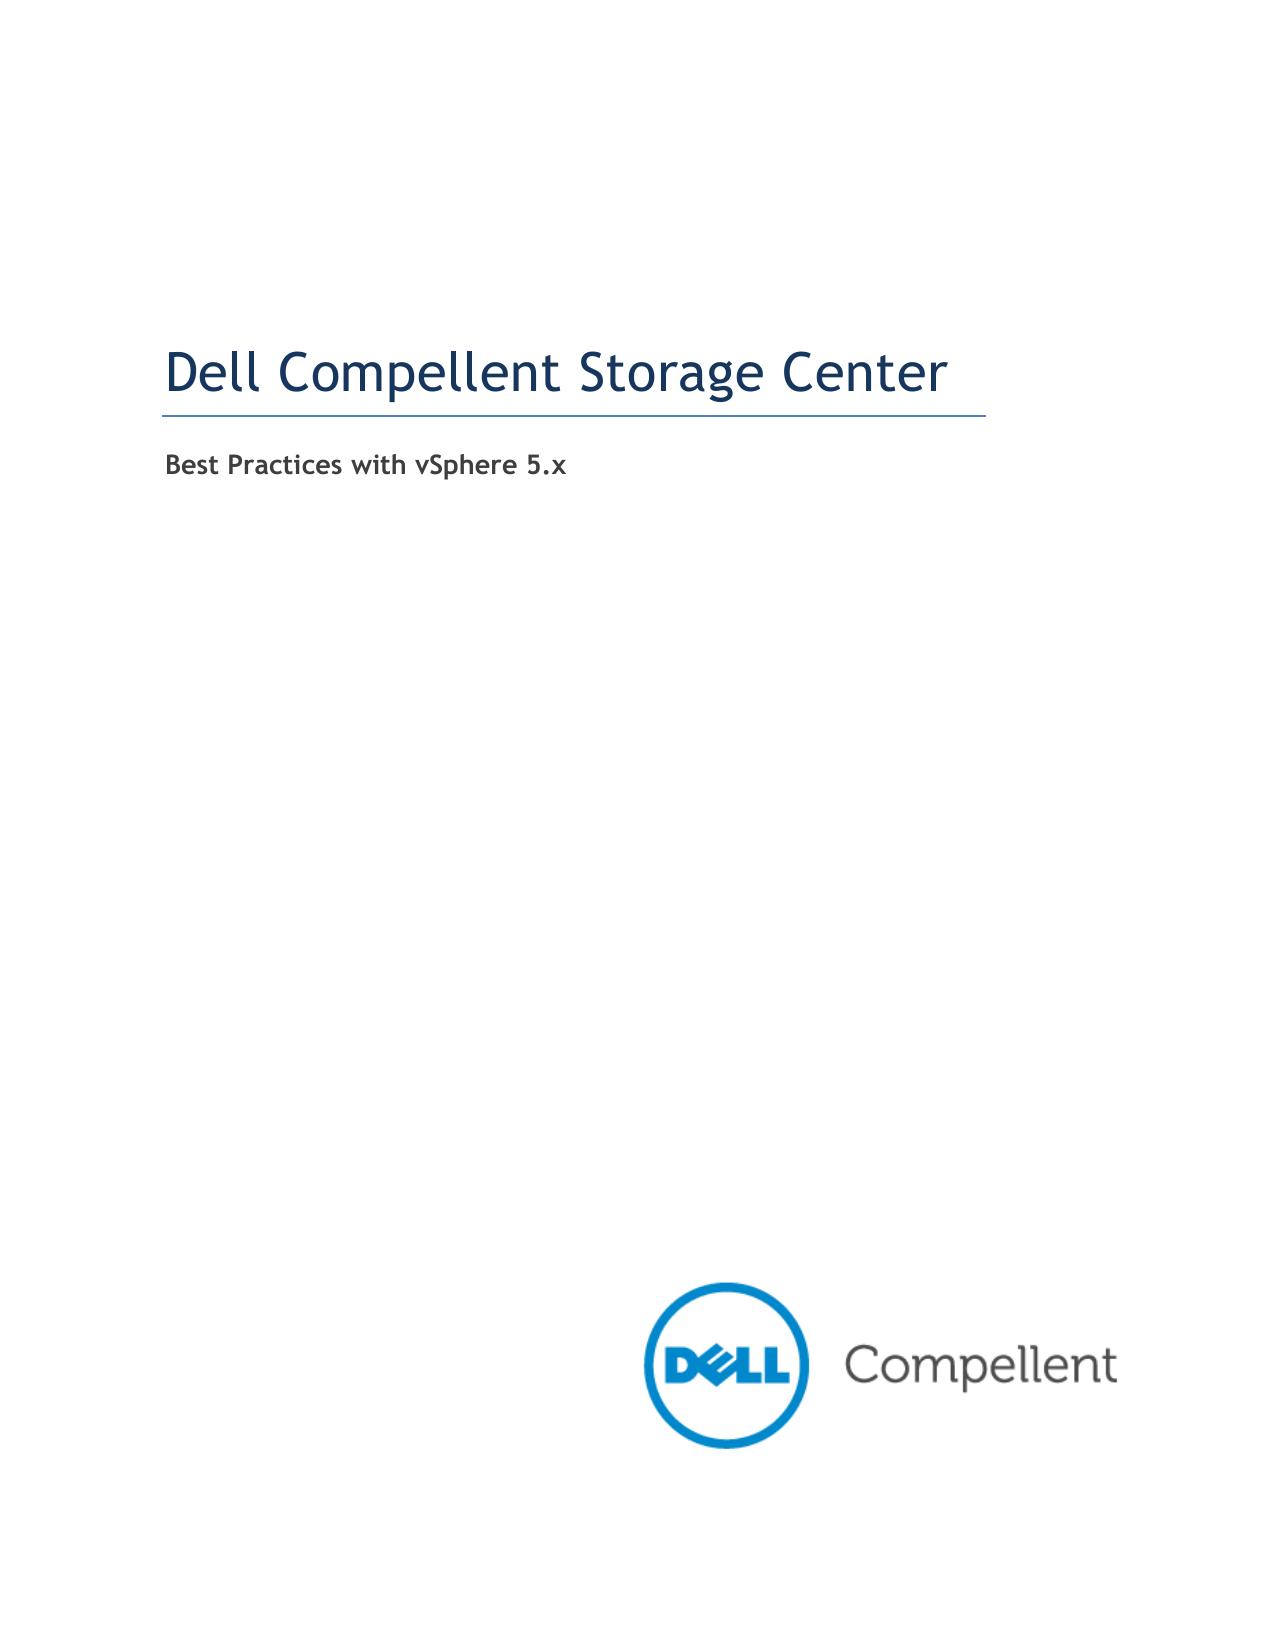 Dell Compellent Best Practices with VMware ESX 5 x | manualzz com